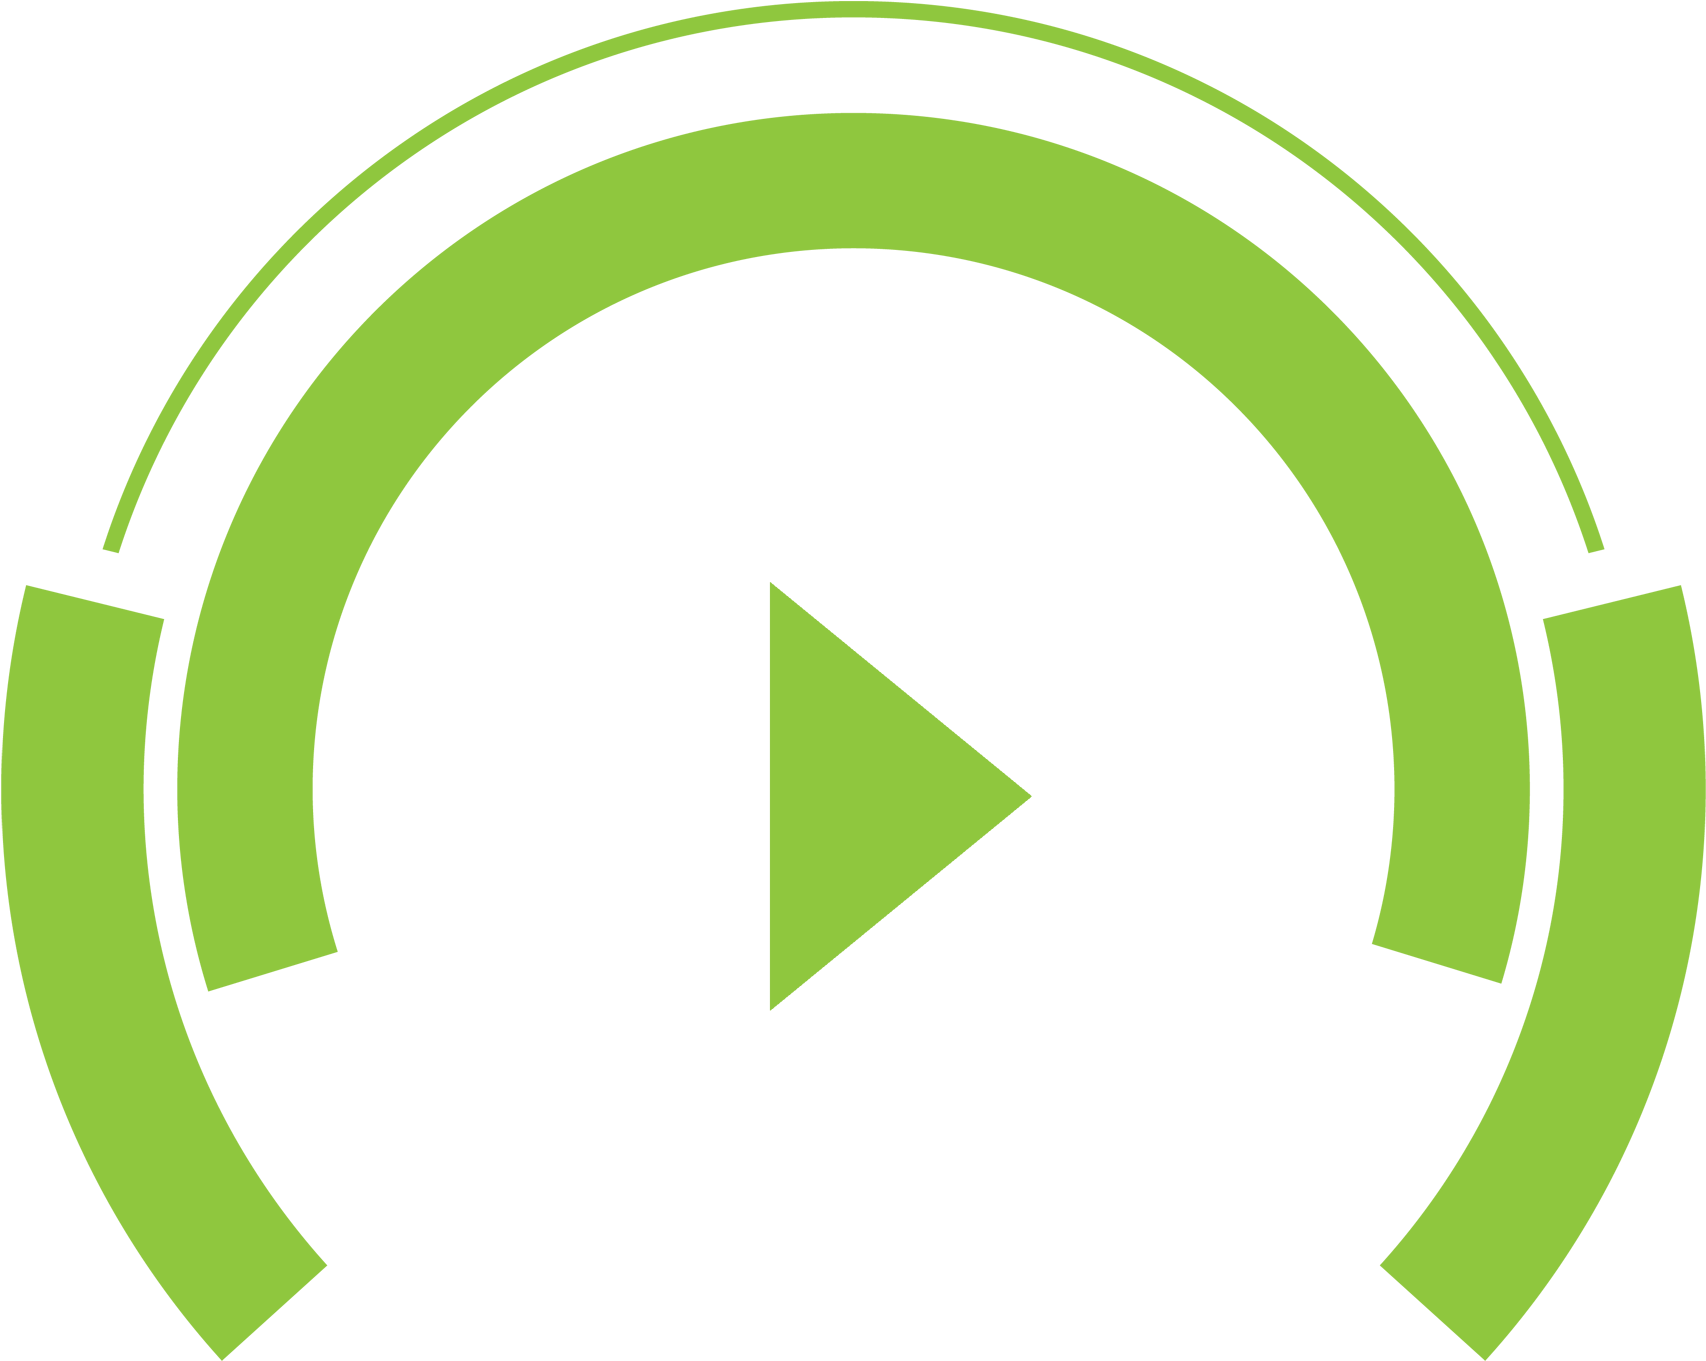 Transparent clip dj descargar musica gratis mp3 - Watch Our Presentation - Dj Logo Png Play